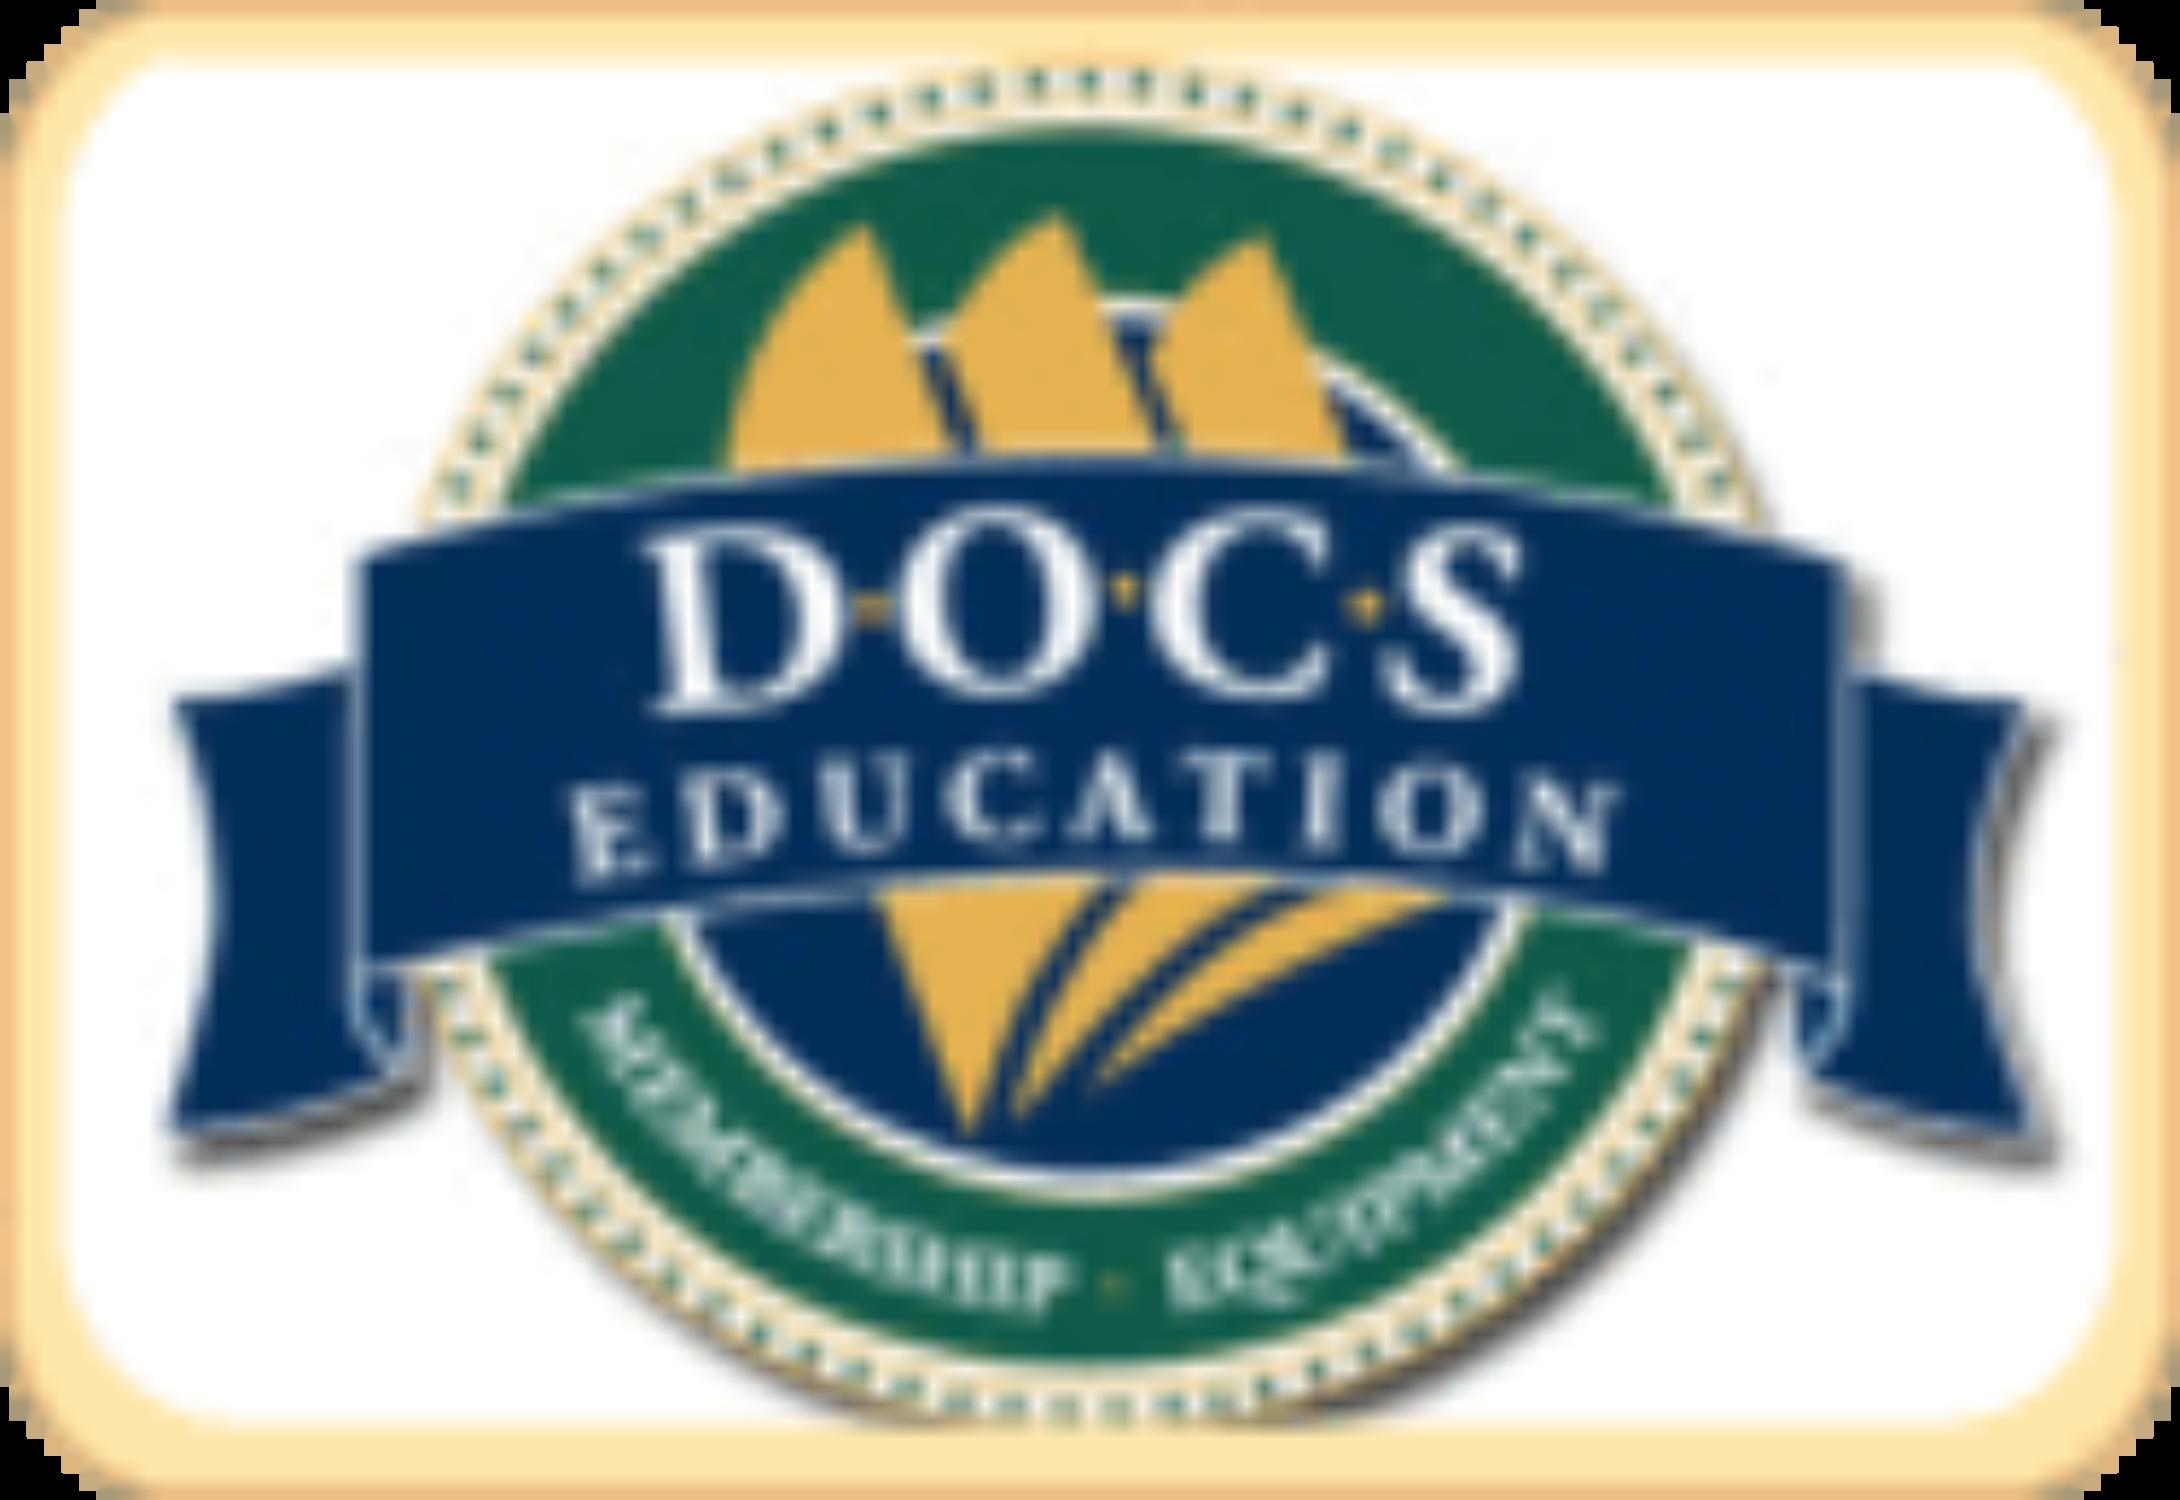 DOCS Education.png